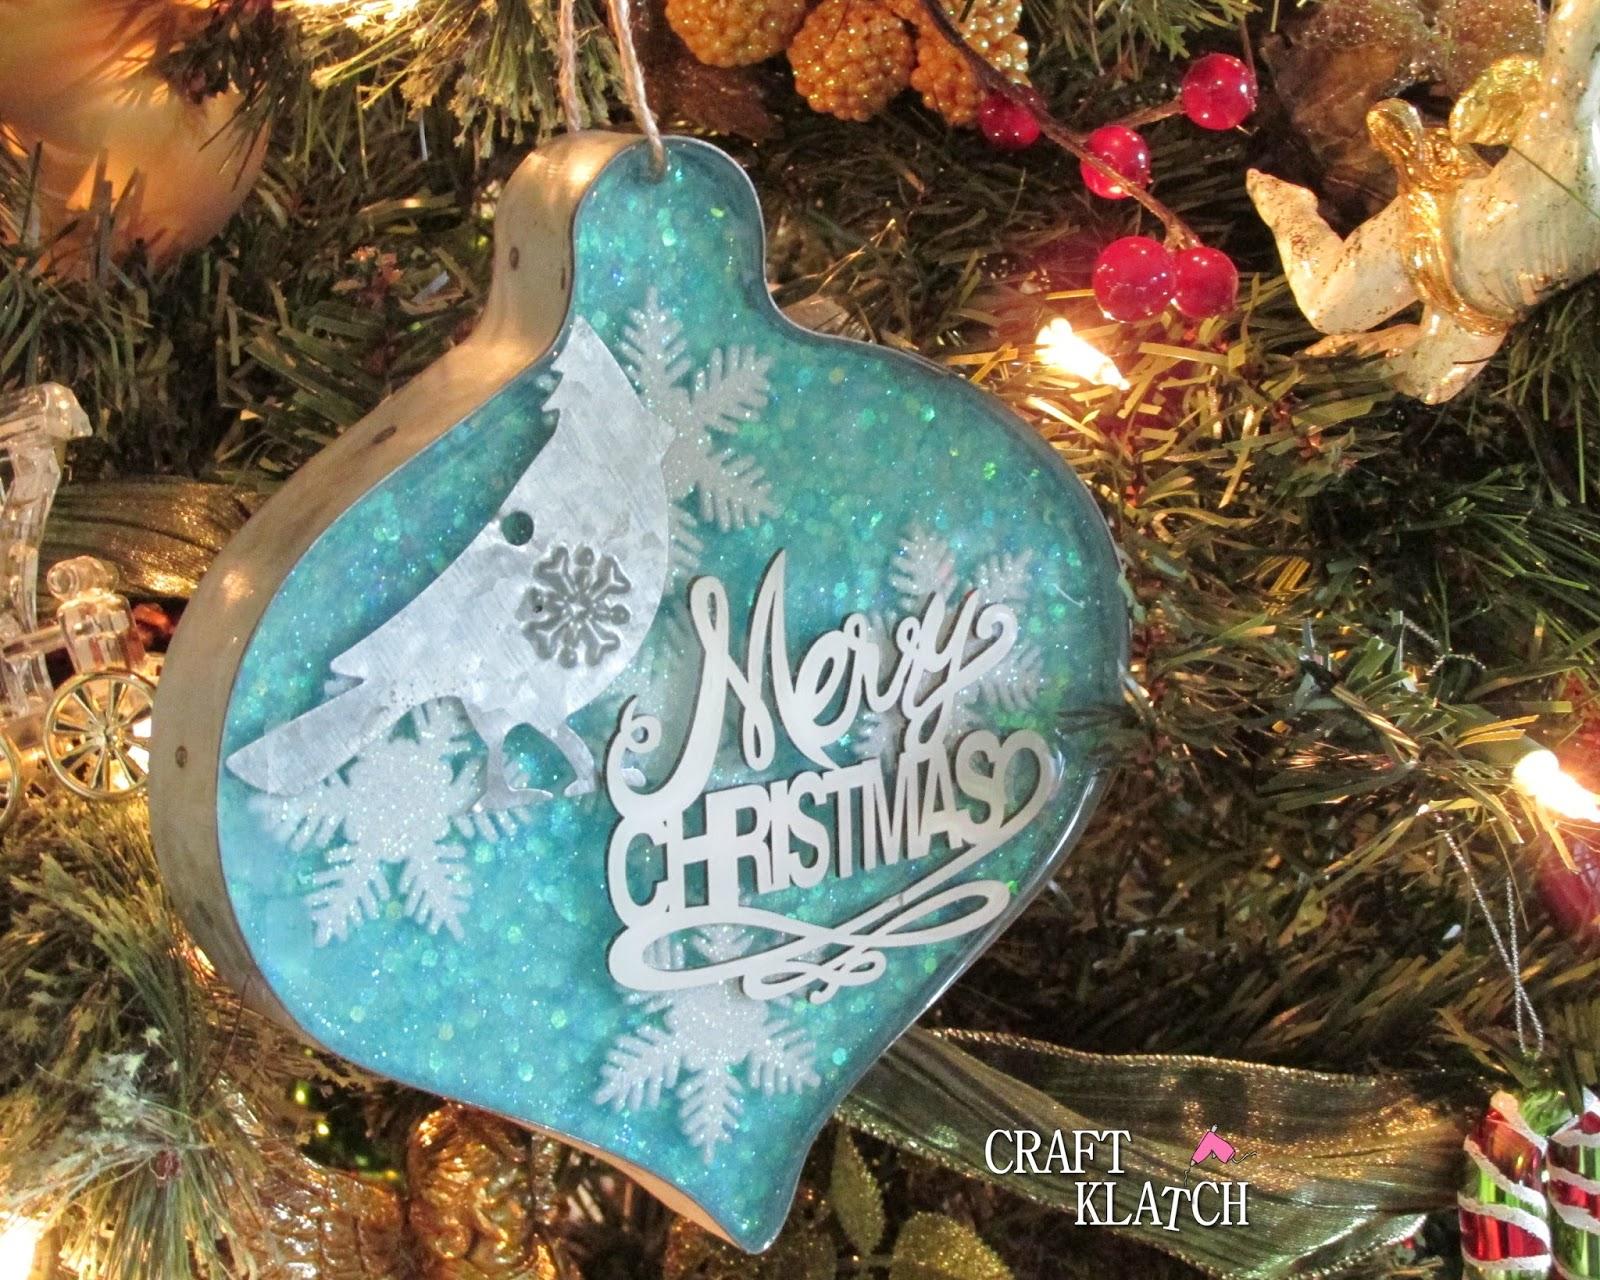 Resin Christmas Ornaments.Craft Klatch Glitter Resin And Metal Christmas Ornament